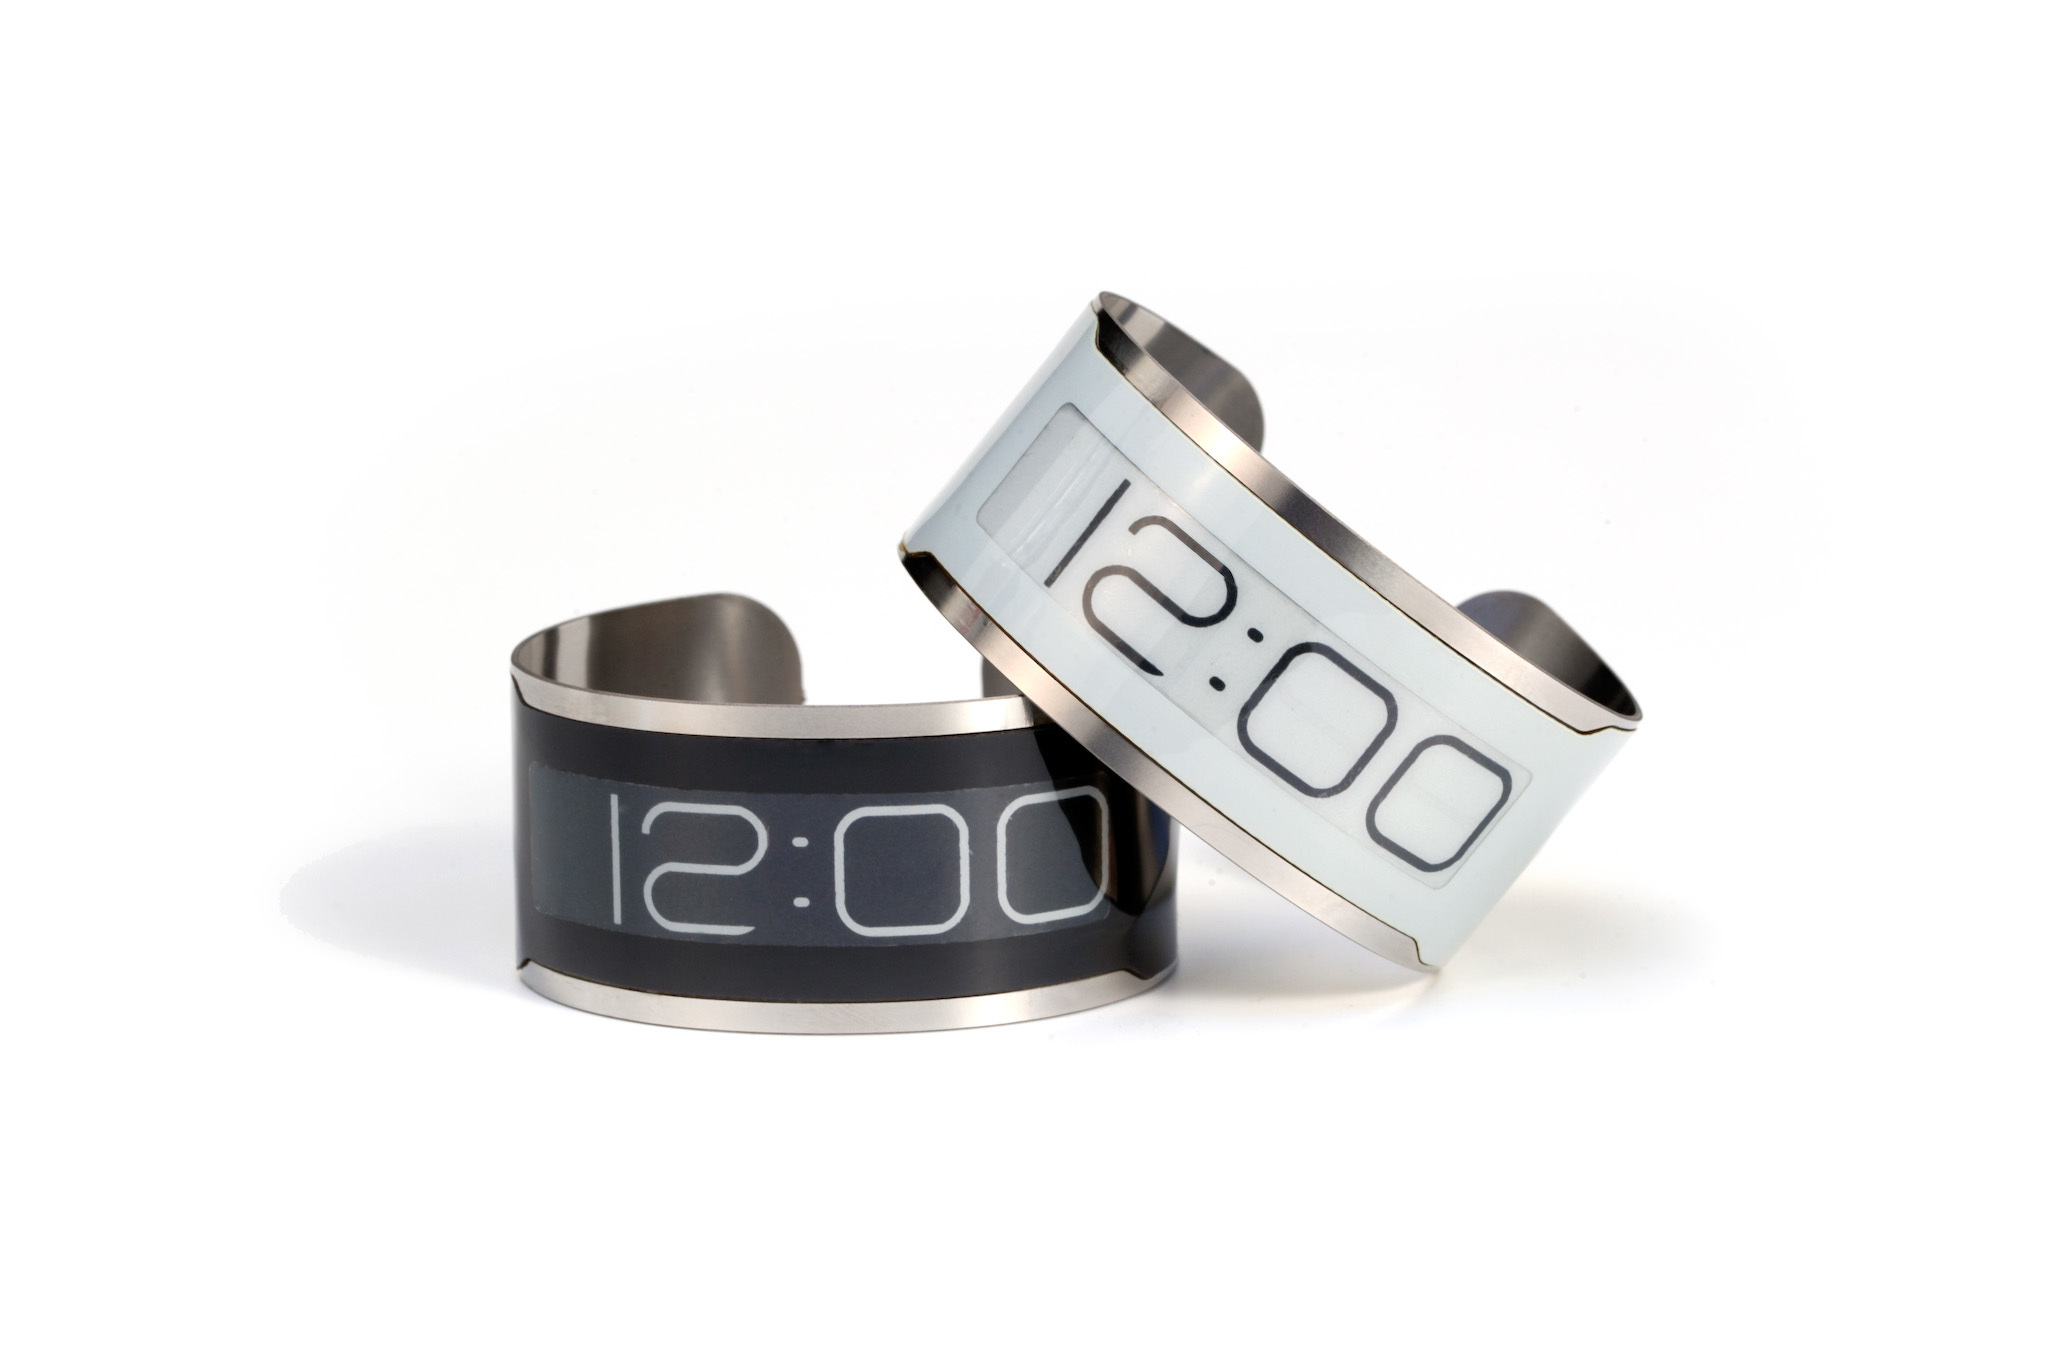 CST-01 Wristwatch